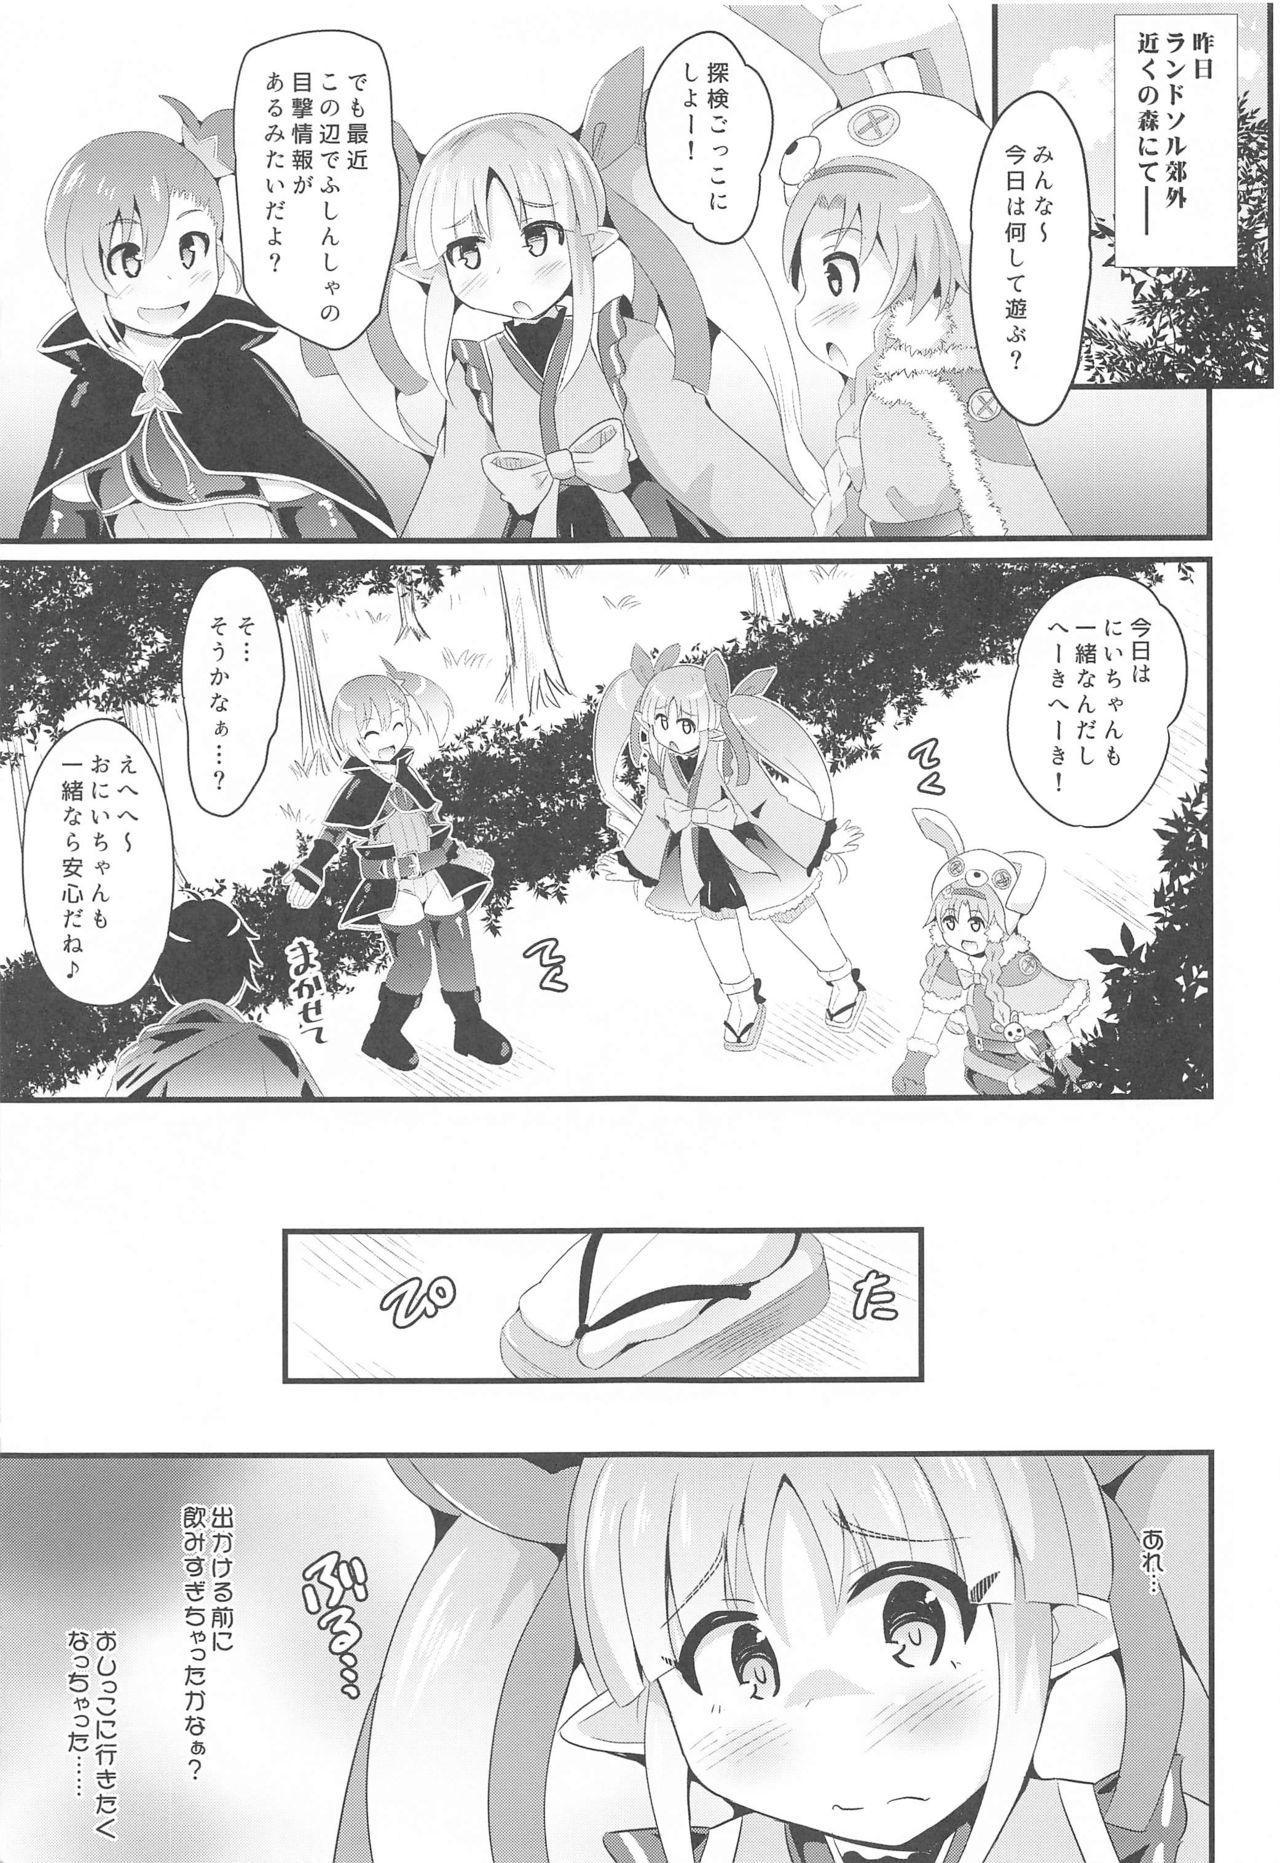 Kyouka-chan to Saimin Hentai Ecchi!! 3